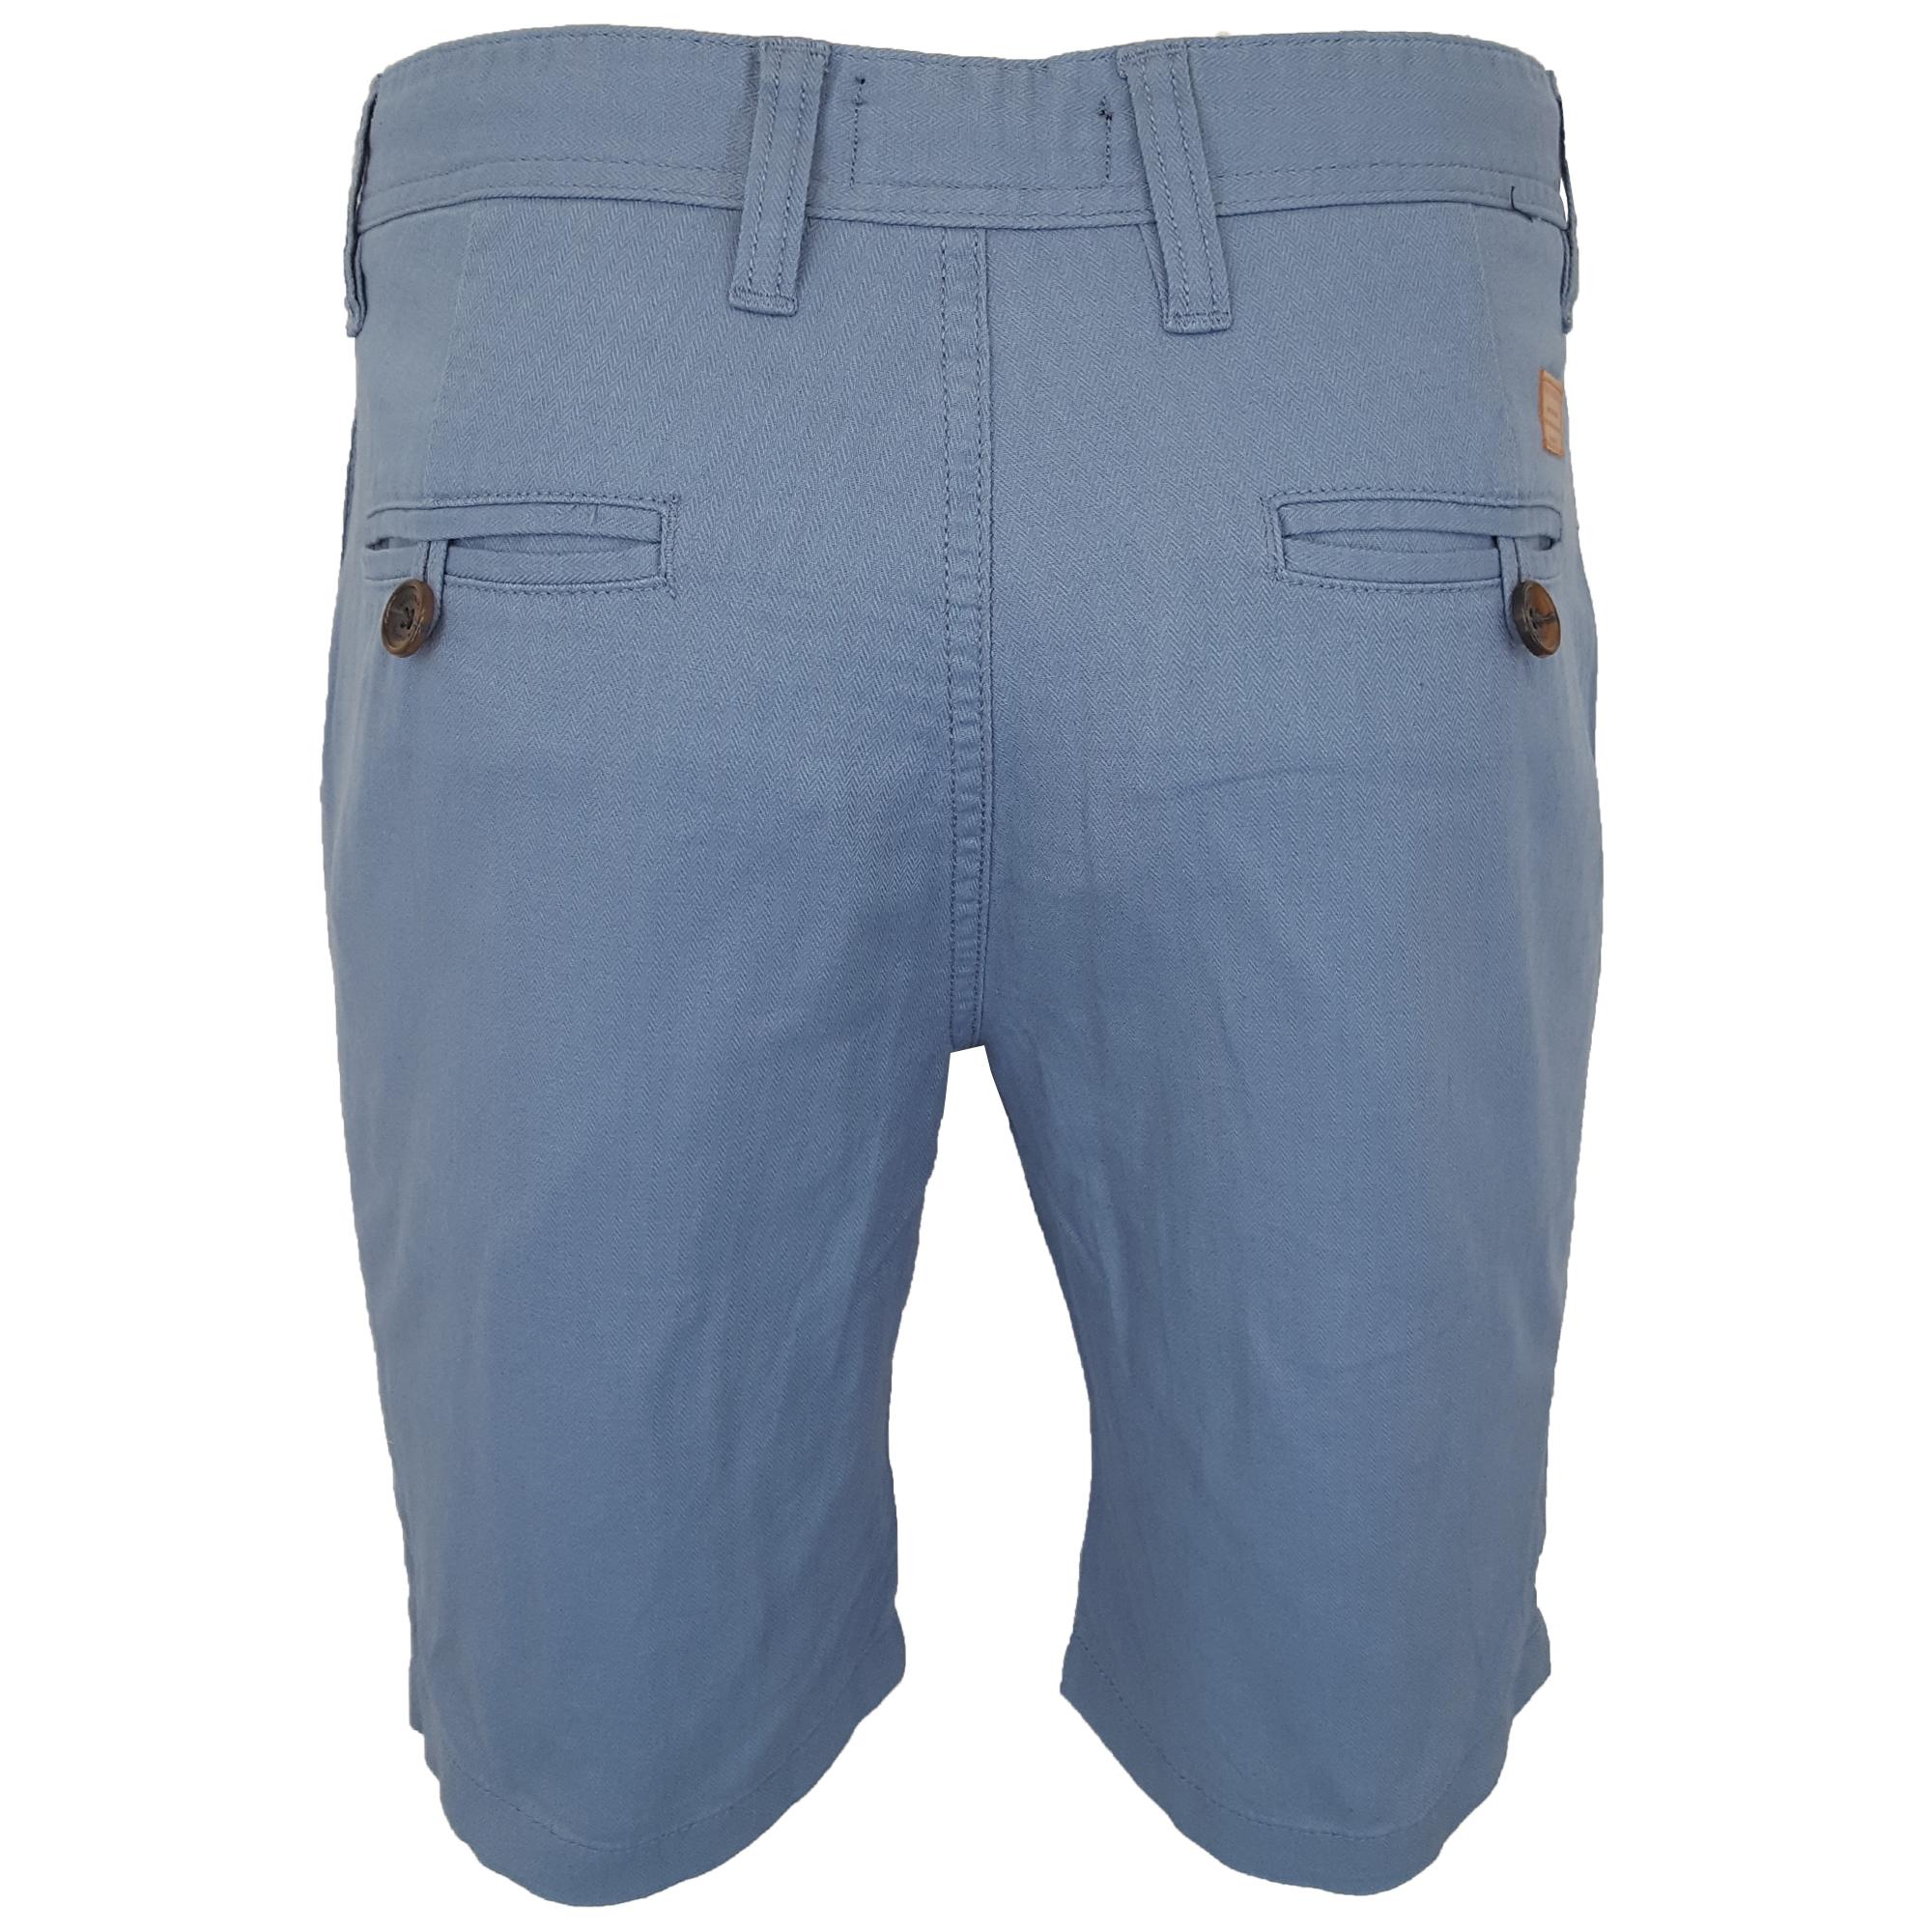 Mens-Linen-Chino-Shorts-Threadbare-Knee-Length-Half-Pants-Casual-Summer-Fashion thumbnail 6